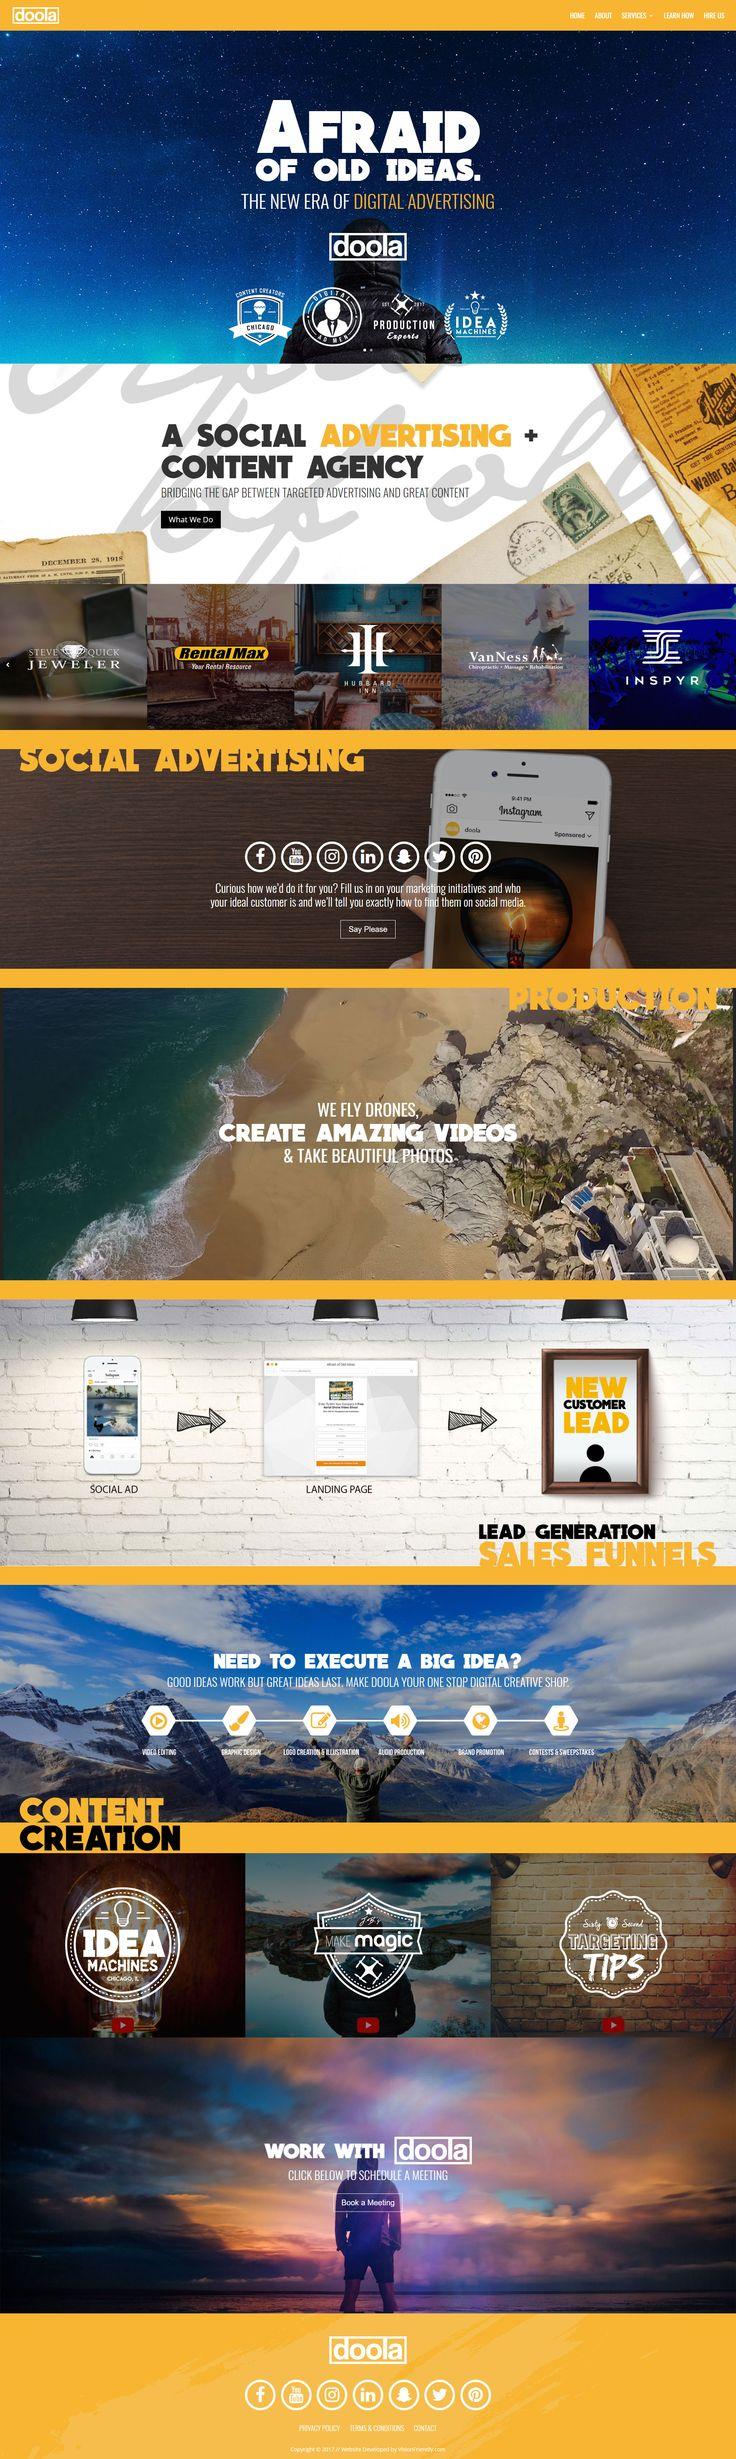 Website for Doola.biz by VisionFriendly.com!  #responsivedesign #responsive #strategy #marketing #digitalpresence #digitalmarketing #customdesign #webdesign #webdevelopment #dynamic #fullscreen #fullwidth #modern #blue #yellow #layered